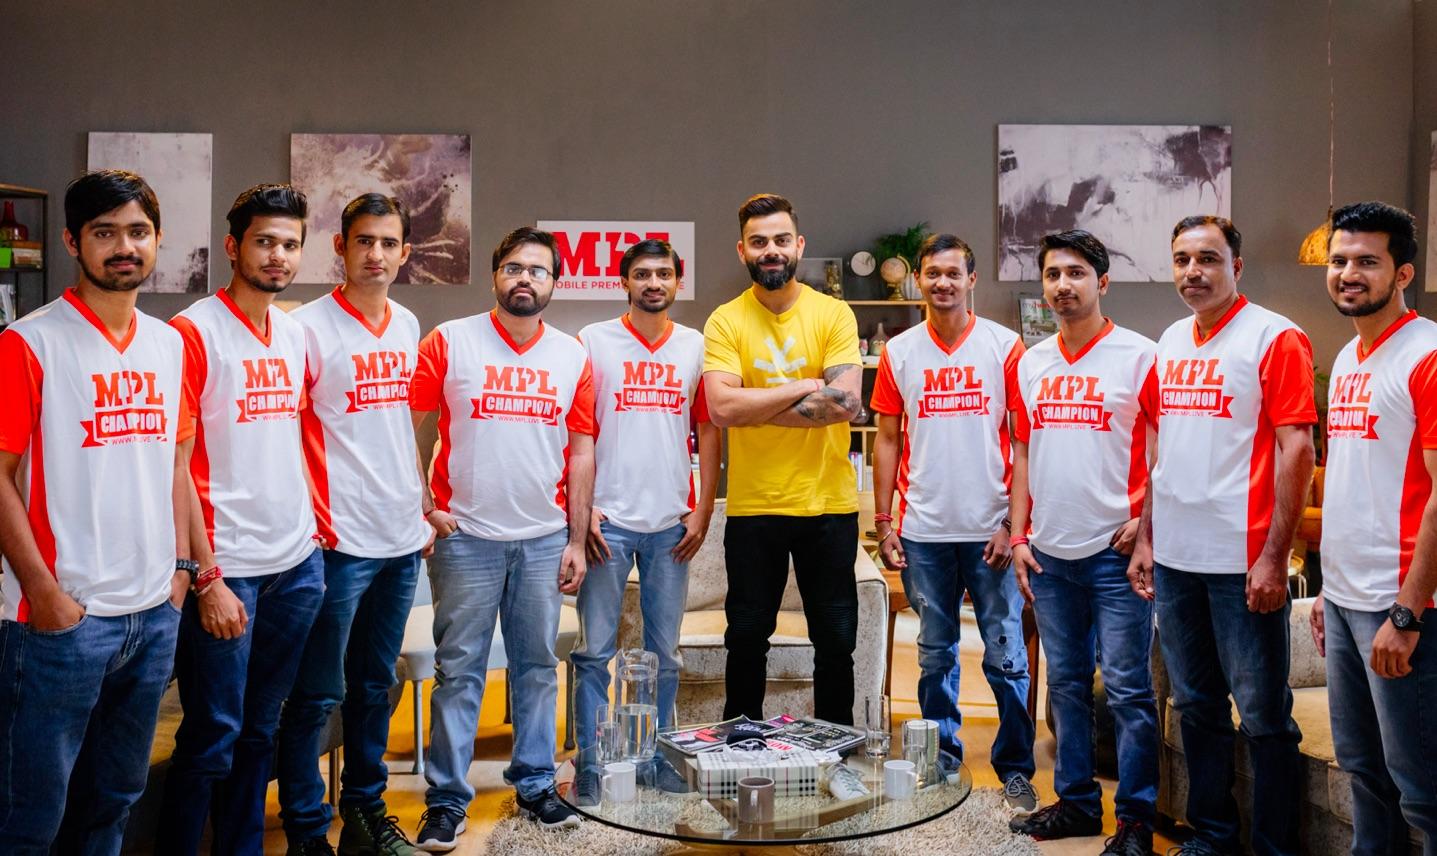 Meet Virat video campaign